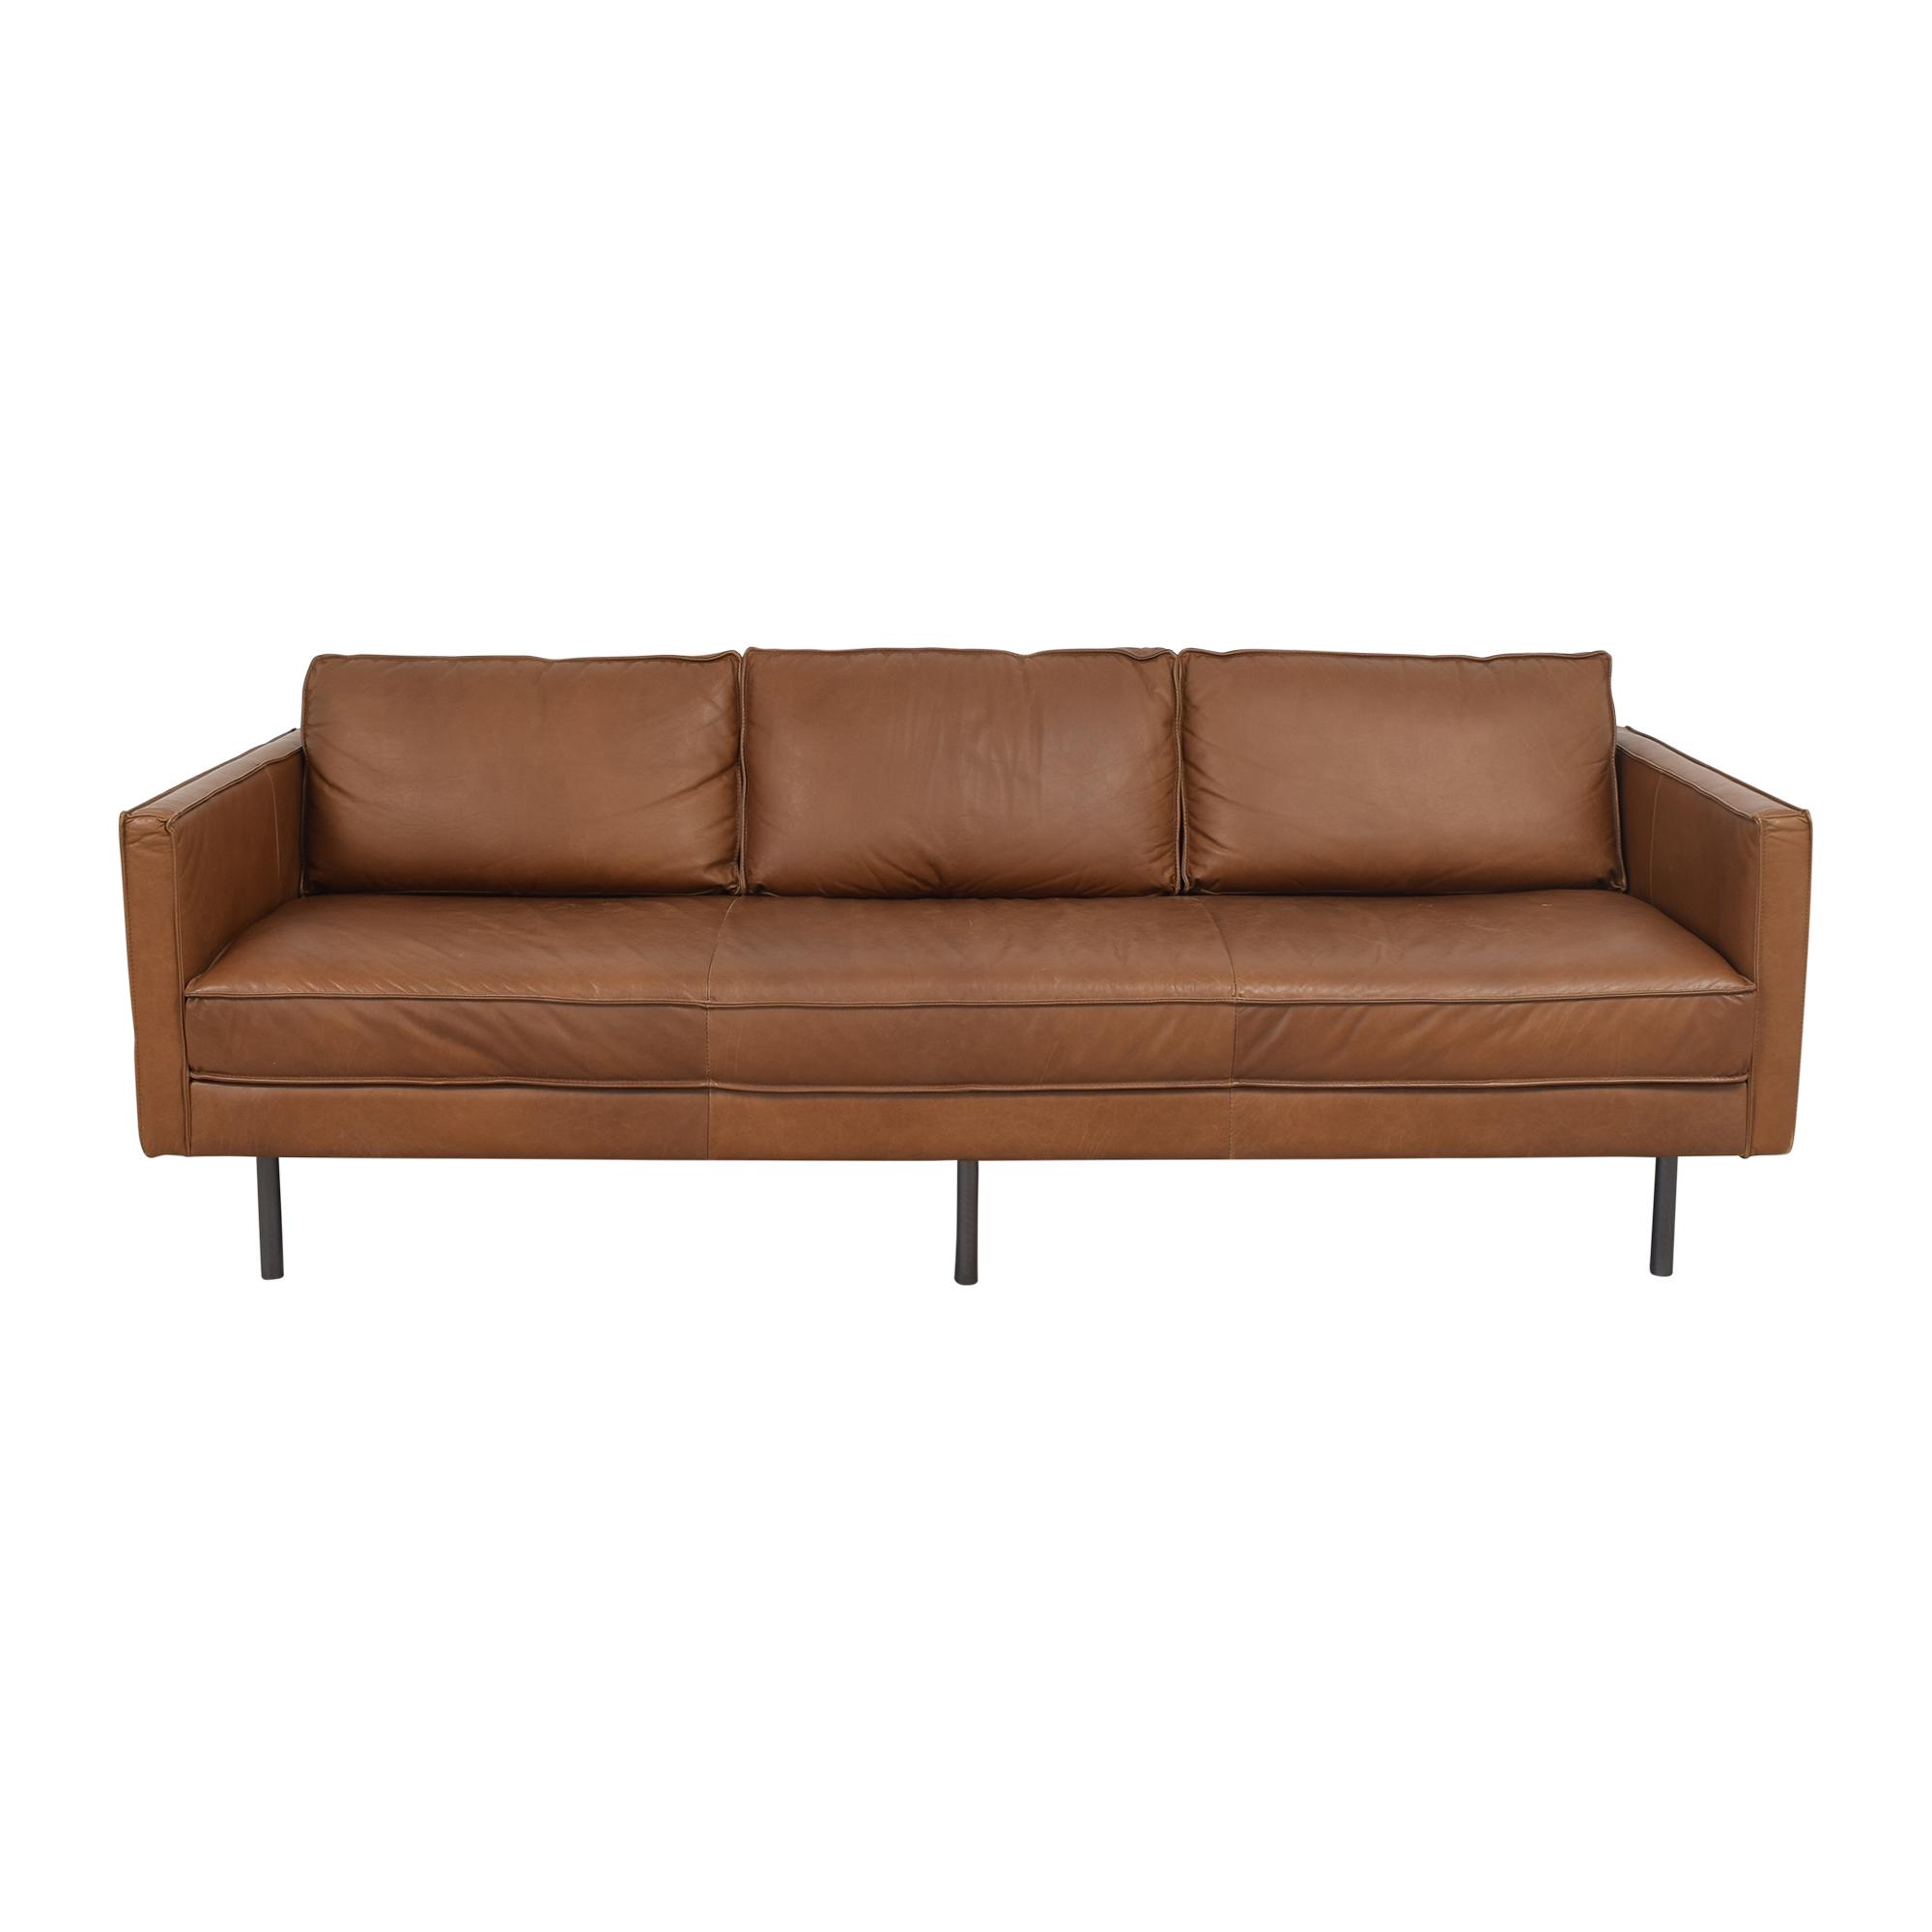 West Elm West Elm Axel Bench Cushion Sofa used